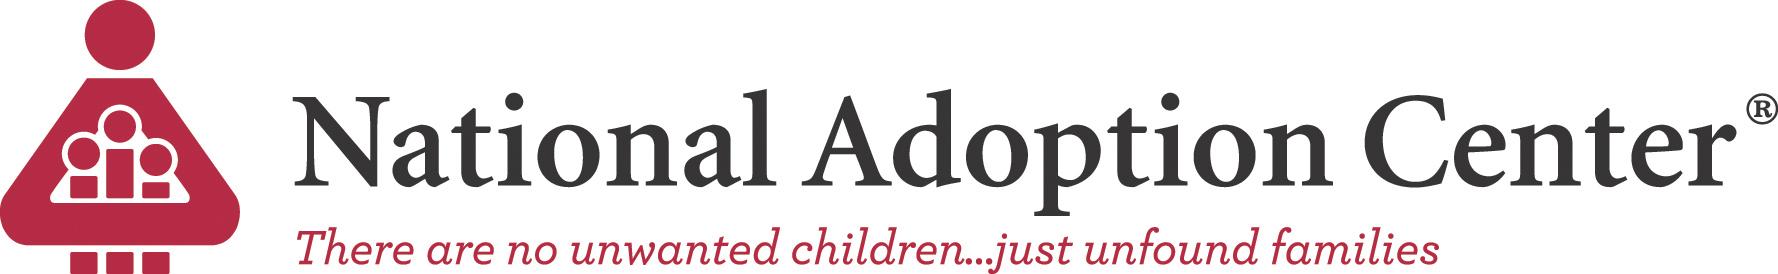 AdoptCtr